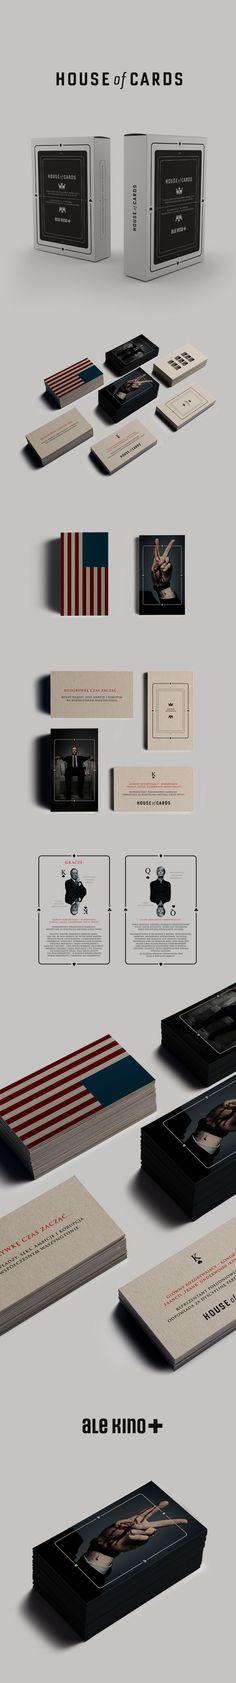 pinterest.com/fra411 #branding - House of Cards / Ale Kino+ by Zdunkiewicz